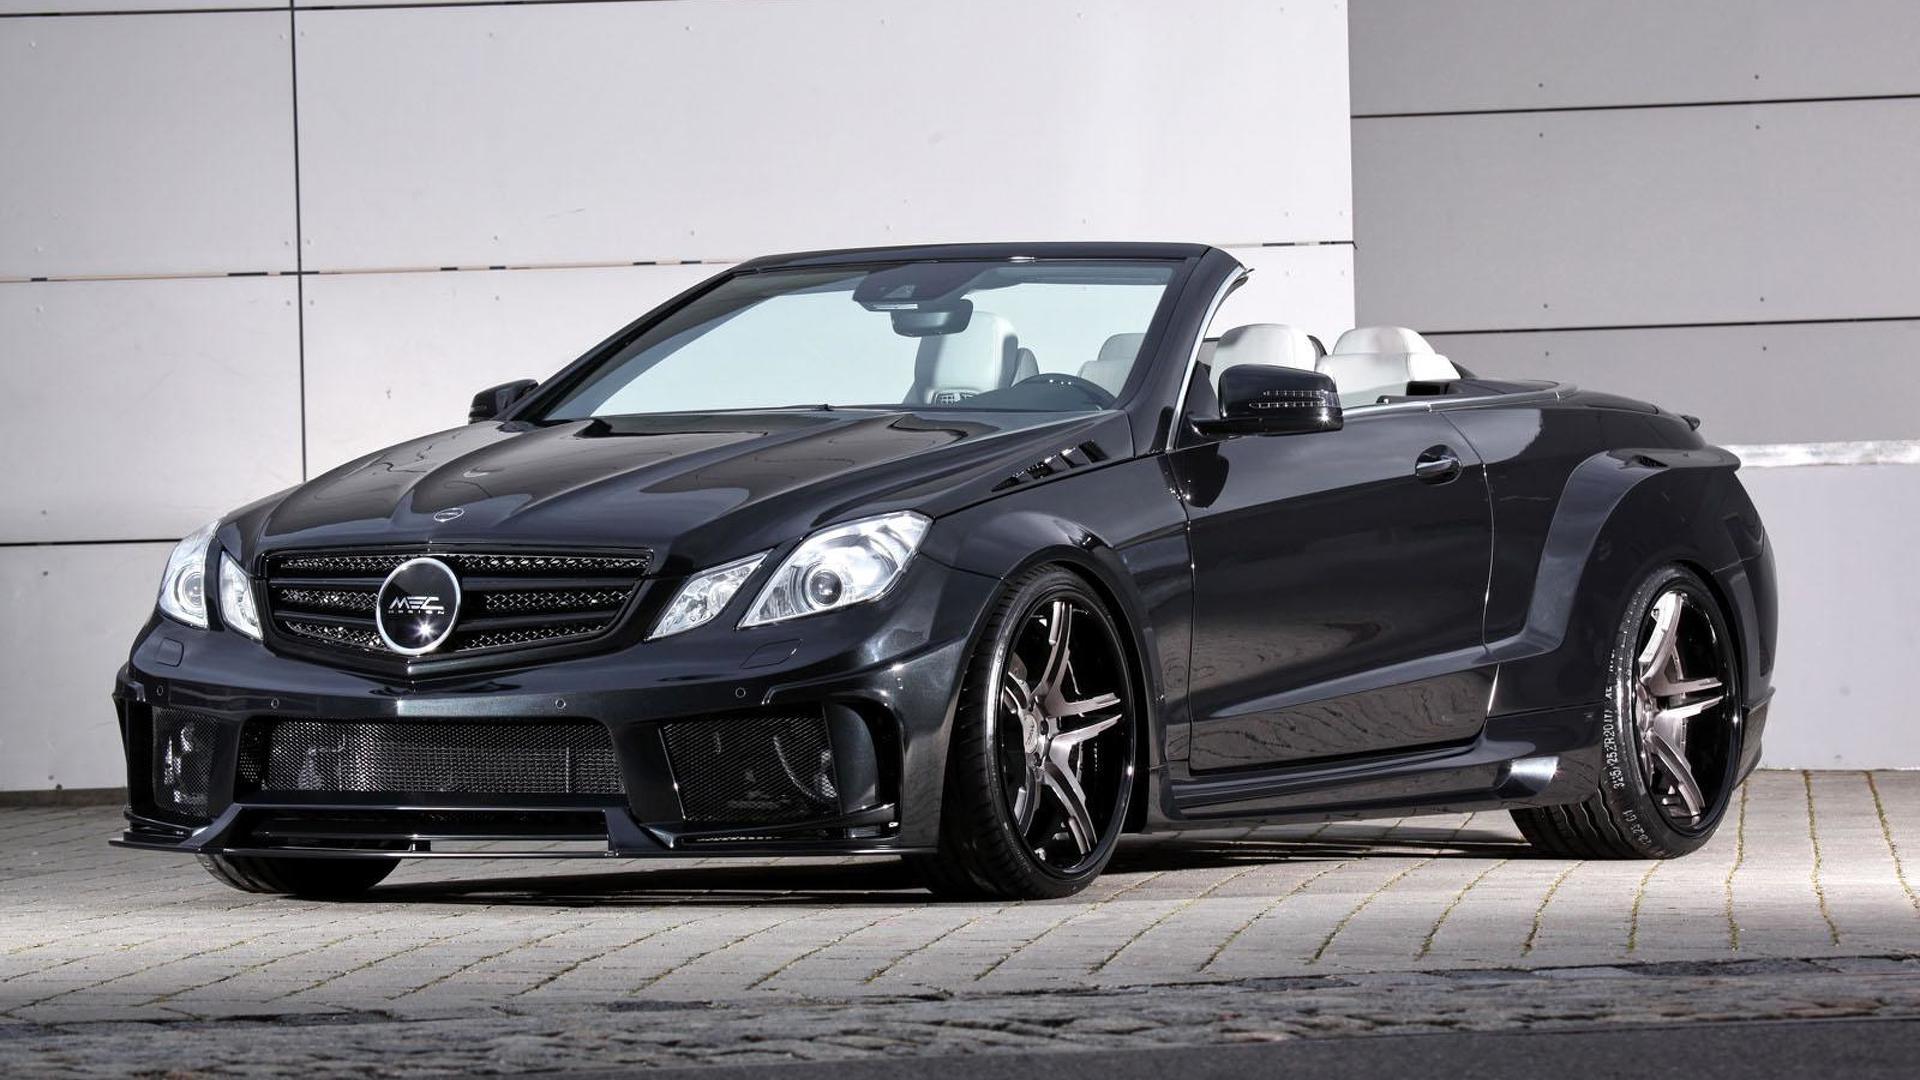 Mercedes E-Class Coupe & Convertible get an aggressive look from MEC Design